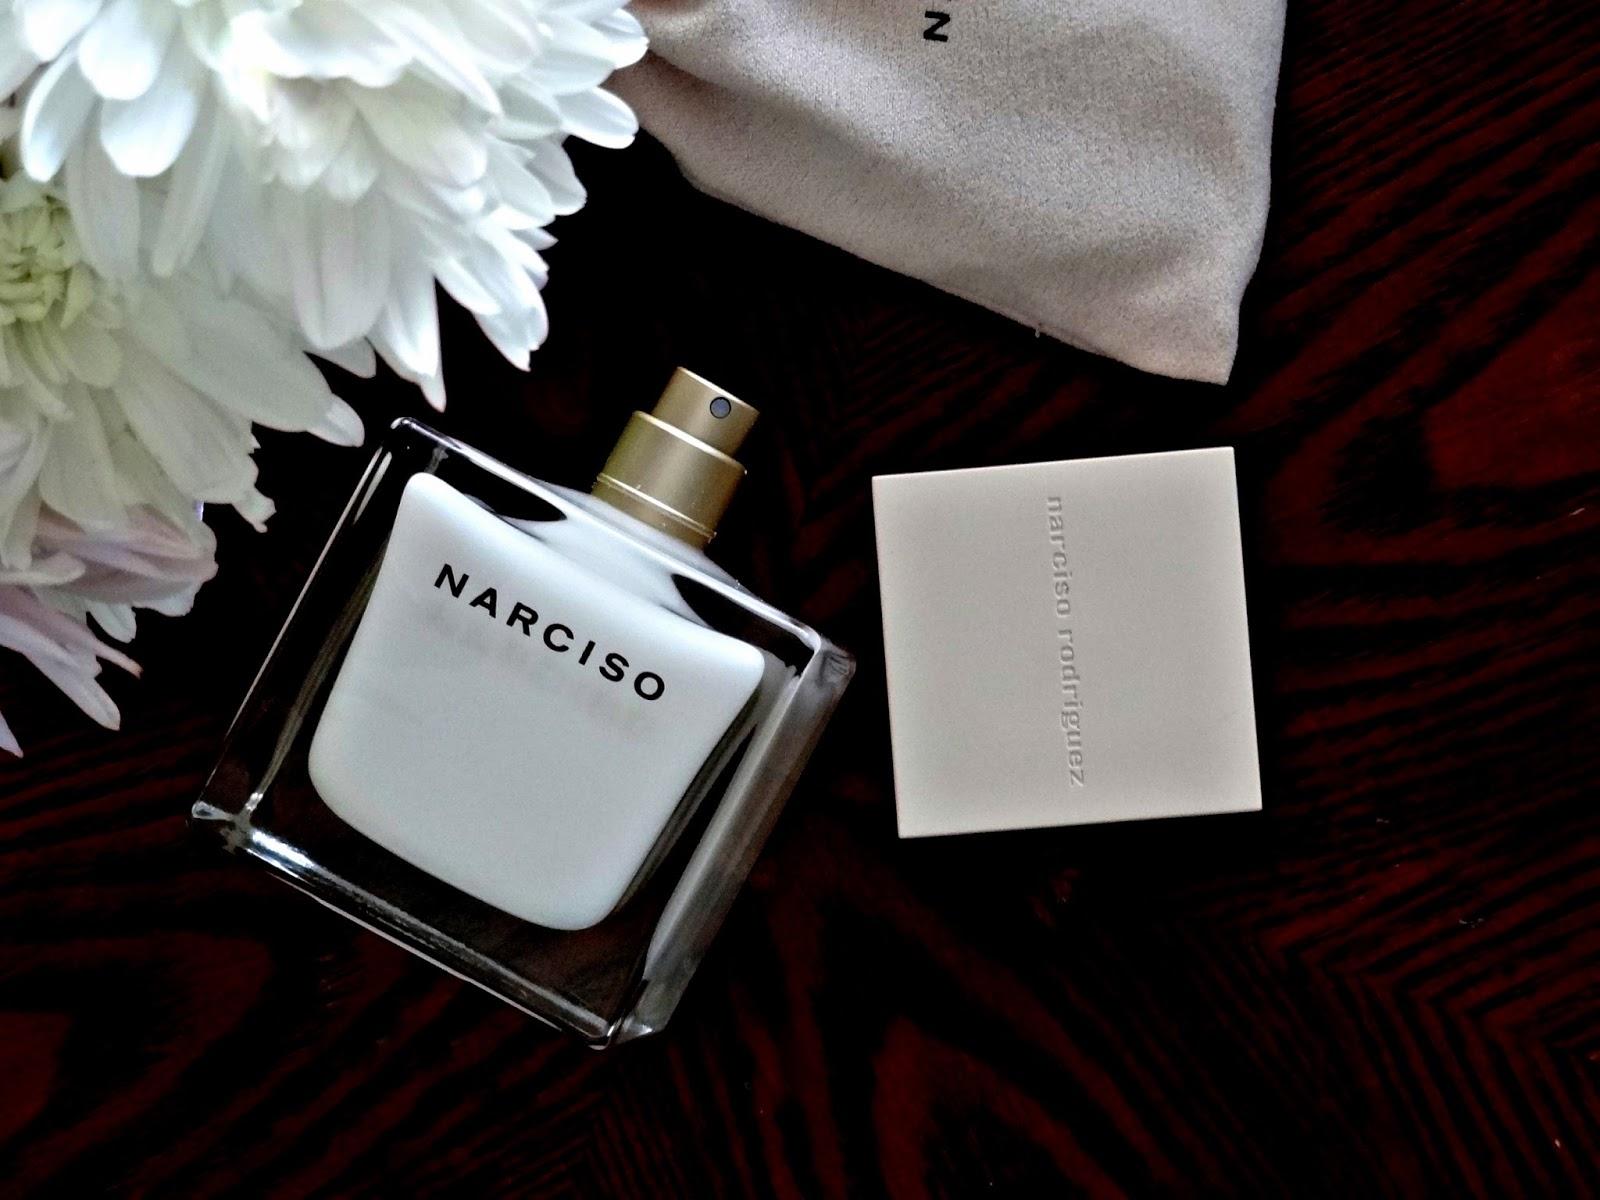 NARCISO by Narciso Rodriguez Eau de Parfum Review, Photos